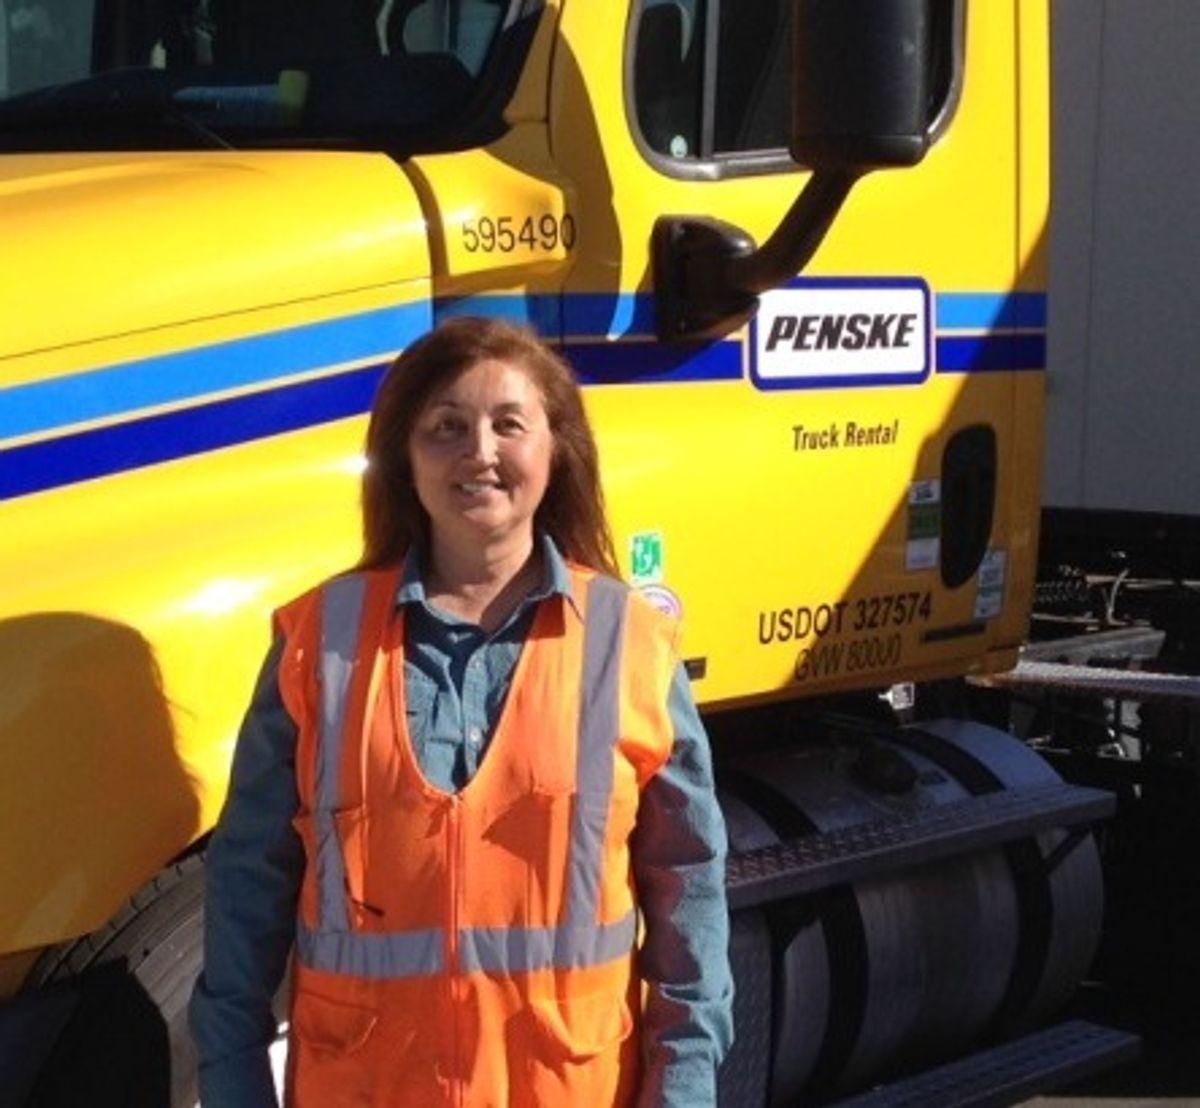 Penske Logistics Driver Enjoys the Scenic Route